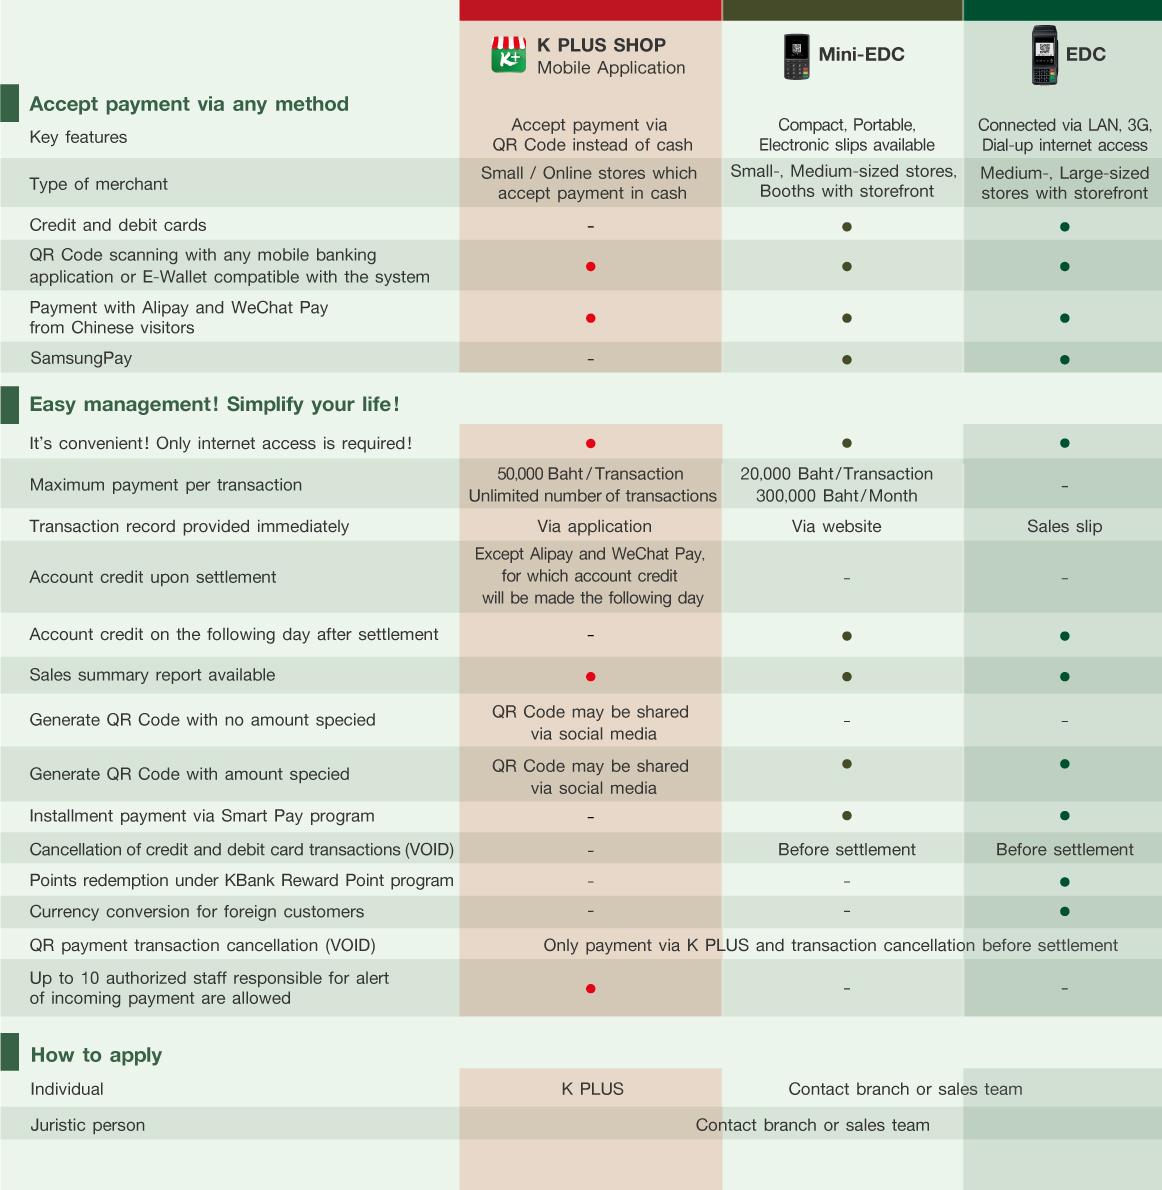 Authorizing Credit Card Transactions by Merchant (EDC / Mini-EDC